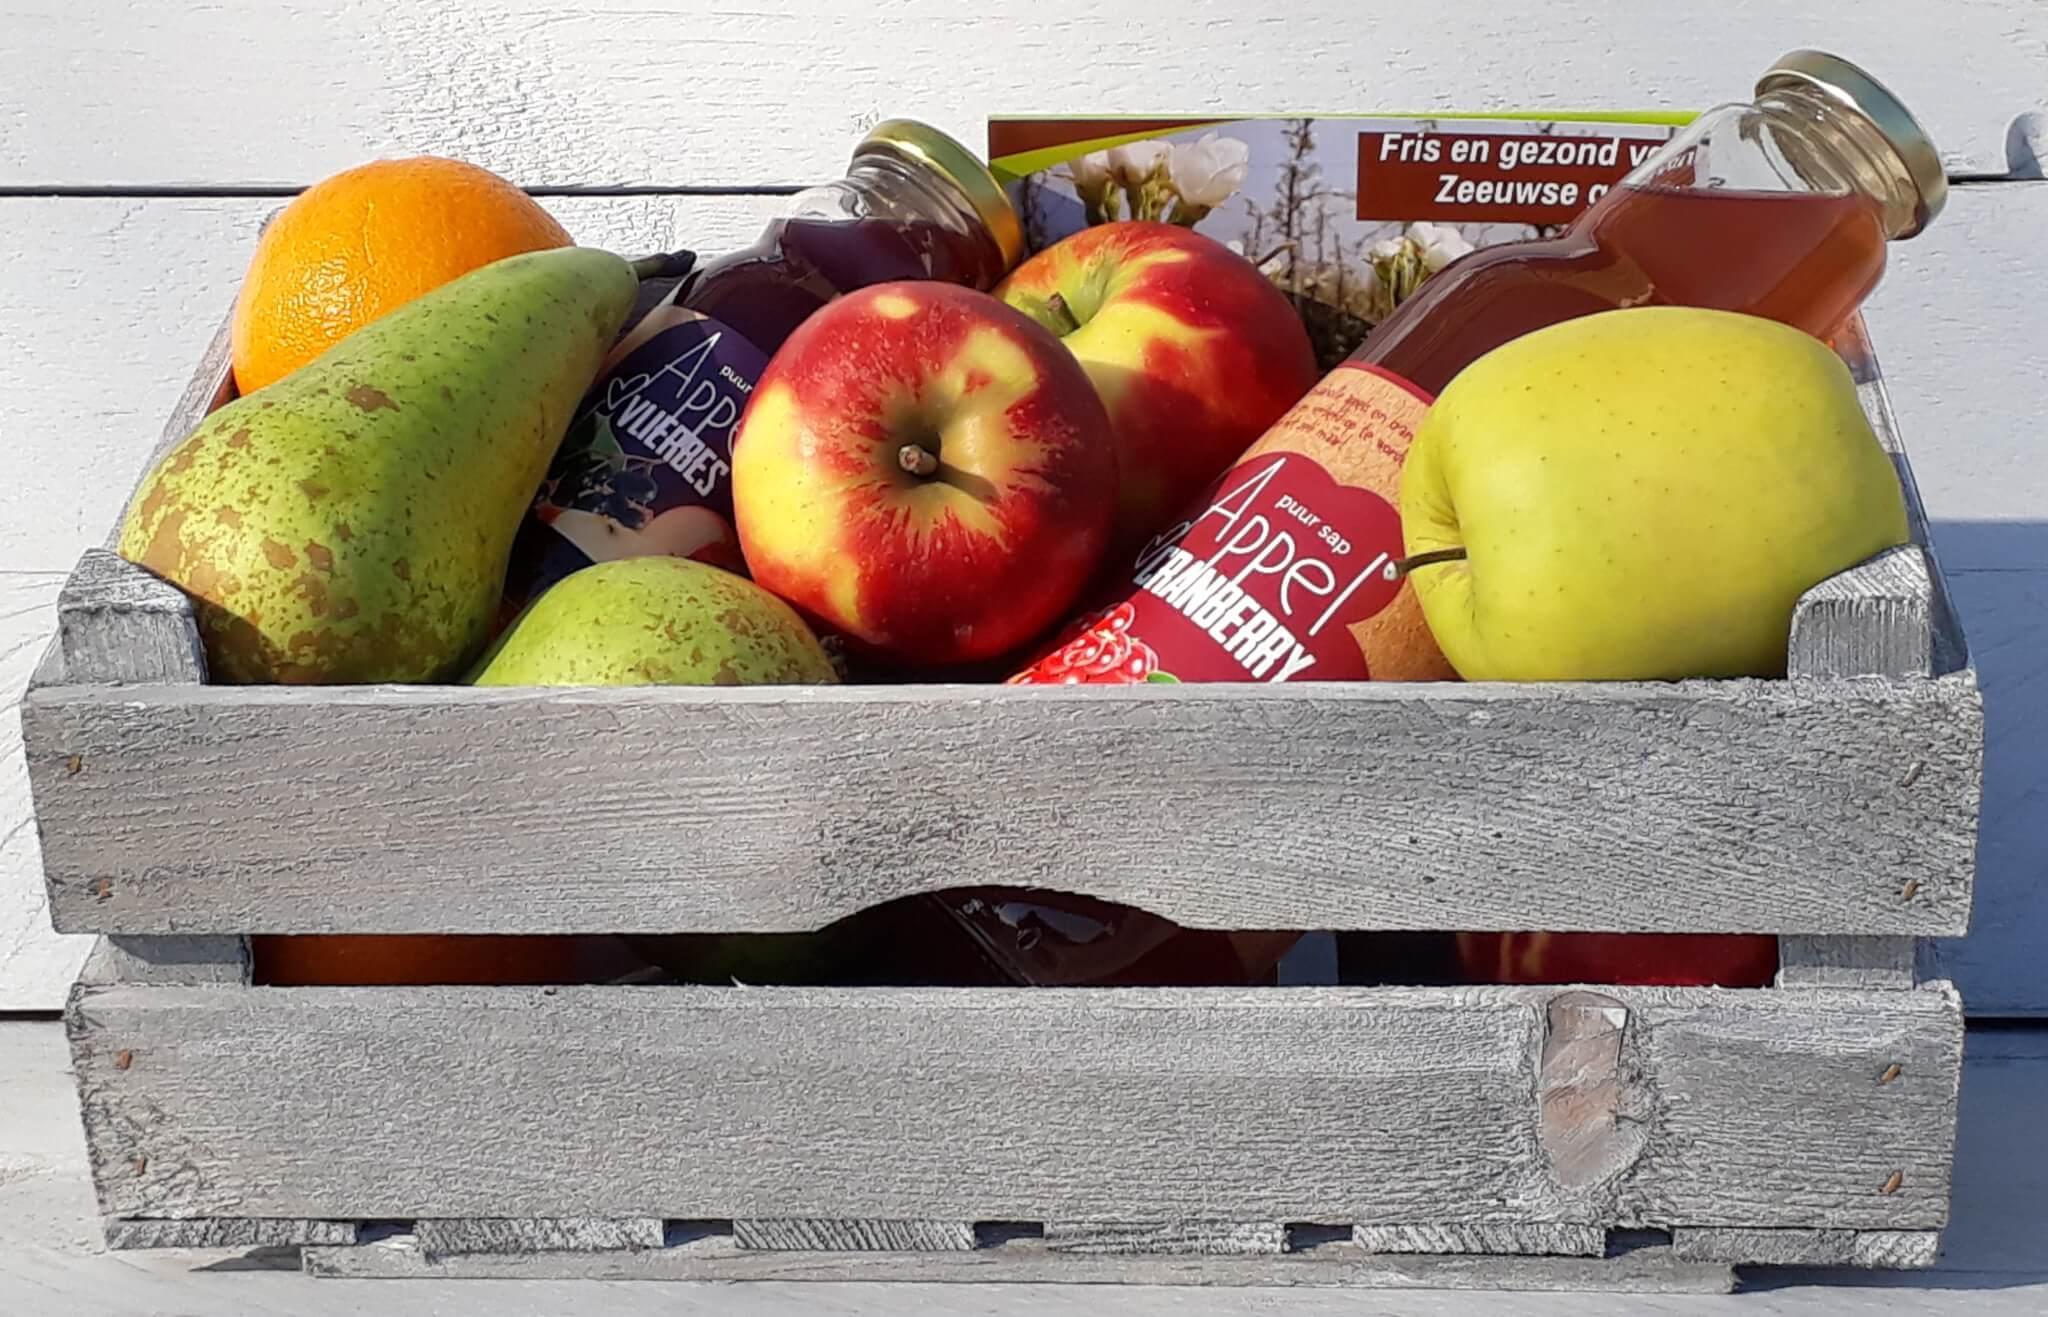 Fruitbedrijf Van den Berge: Sap- en Fruitkistje